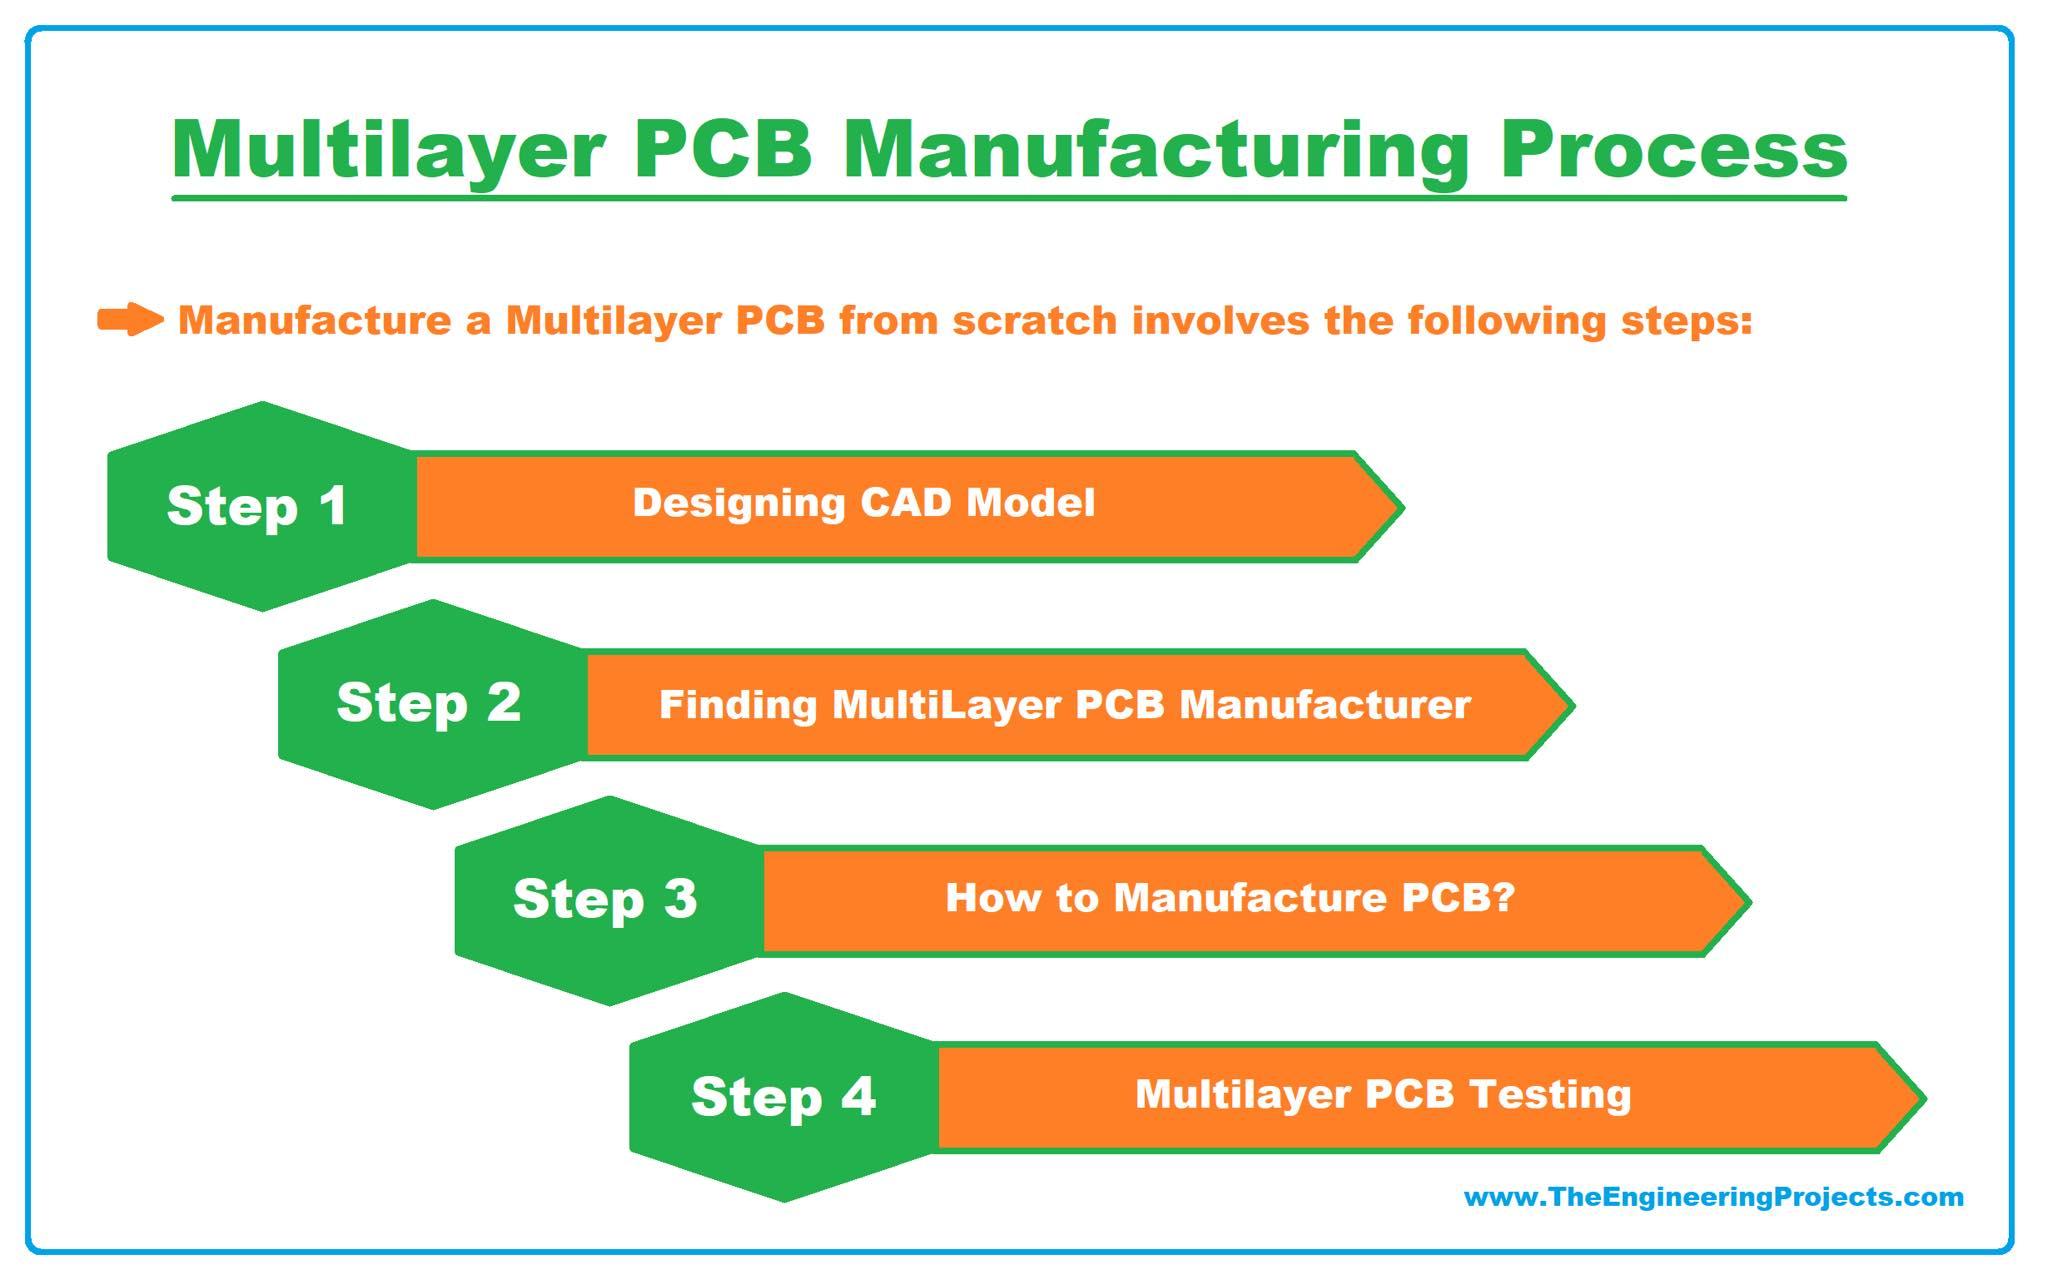 Multilayer PCB, what is Multilayer PCB, Multilayer PCB basics, Multilayer PCB applications, multilayer pcb manufacturing process